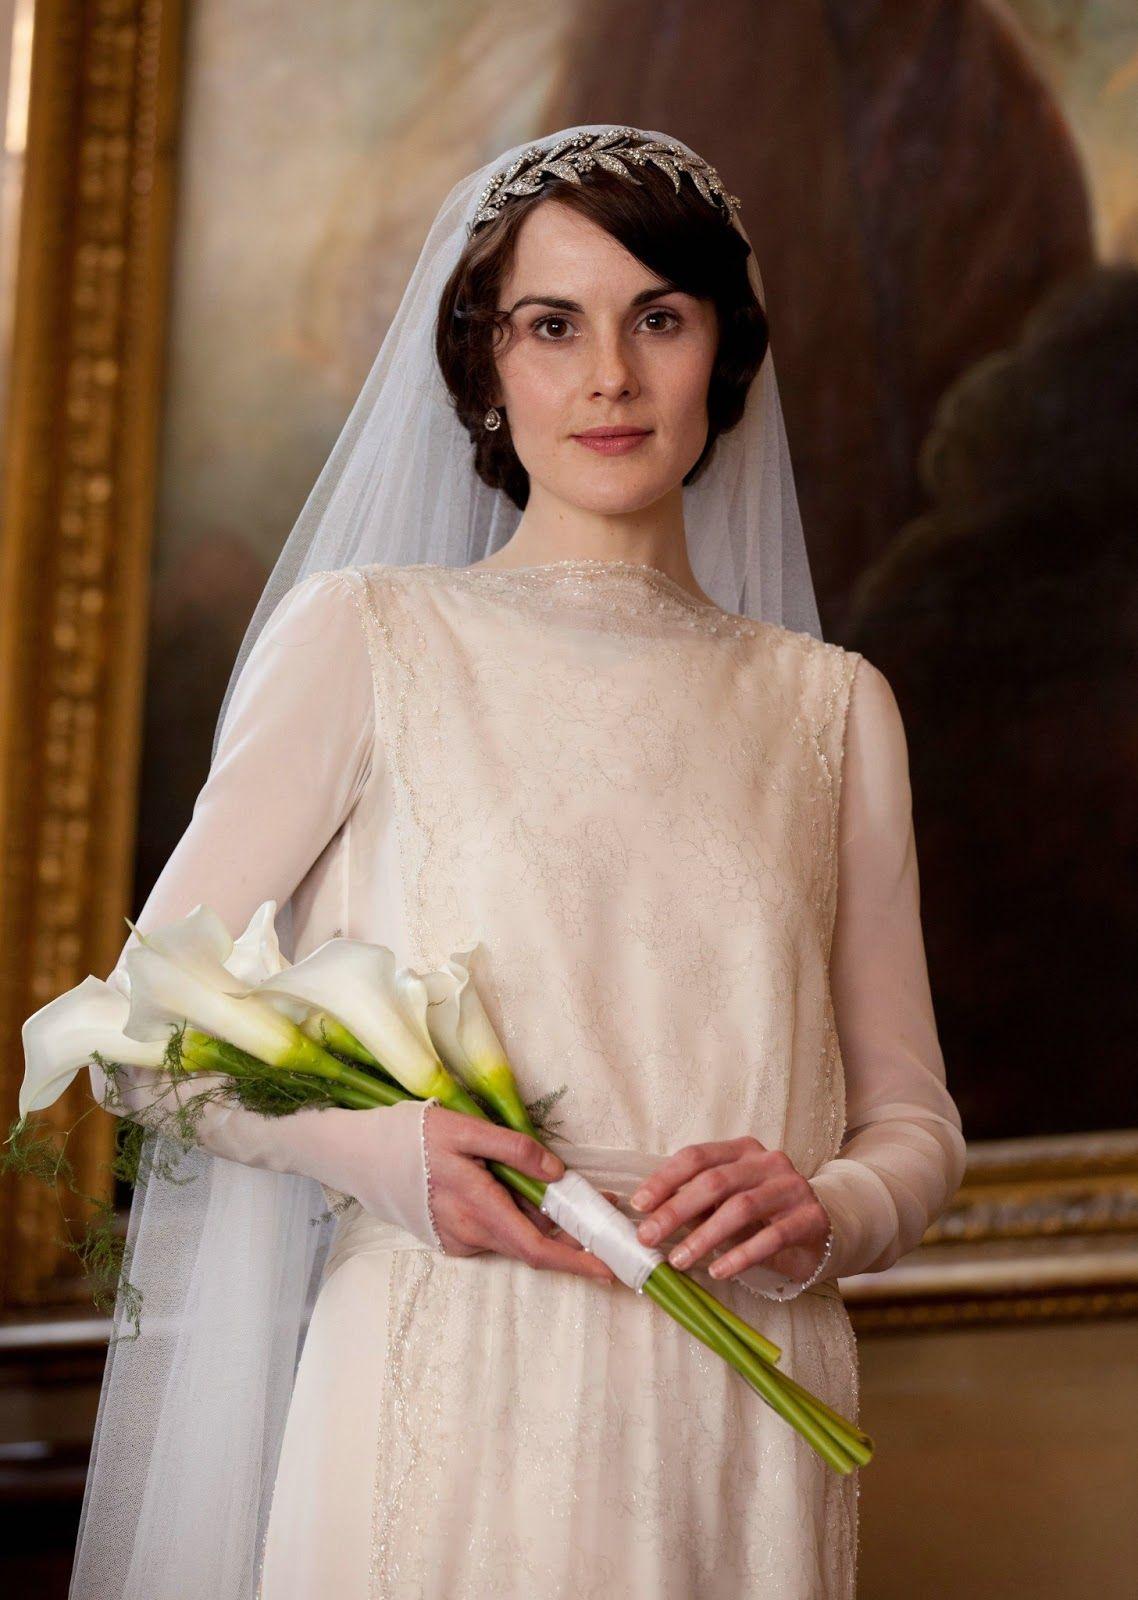 mary s wedding wedding day wedding tiara wedding belles cindi wedding